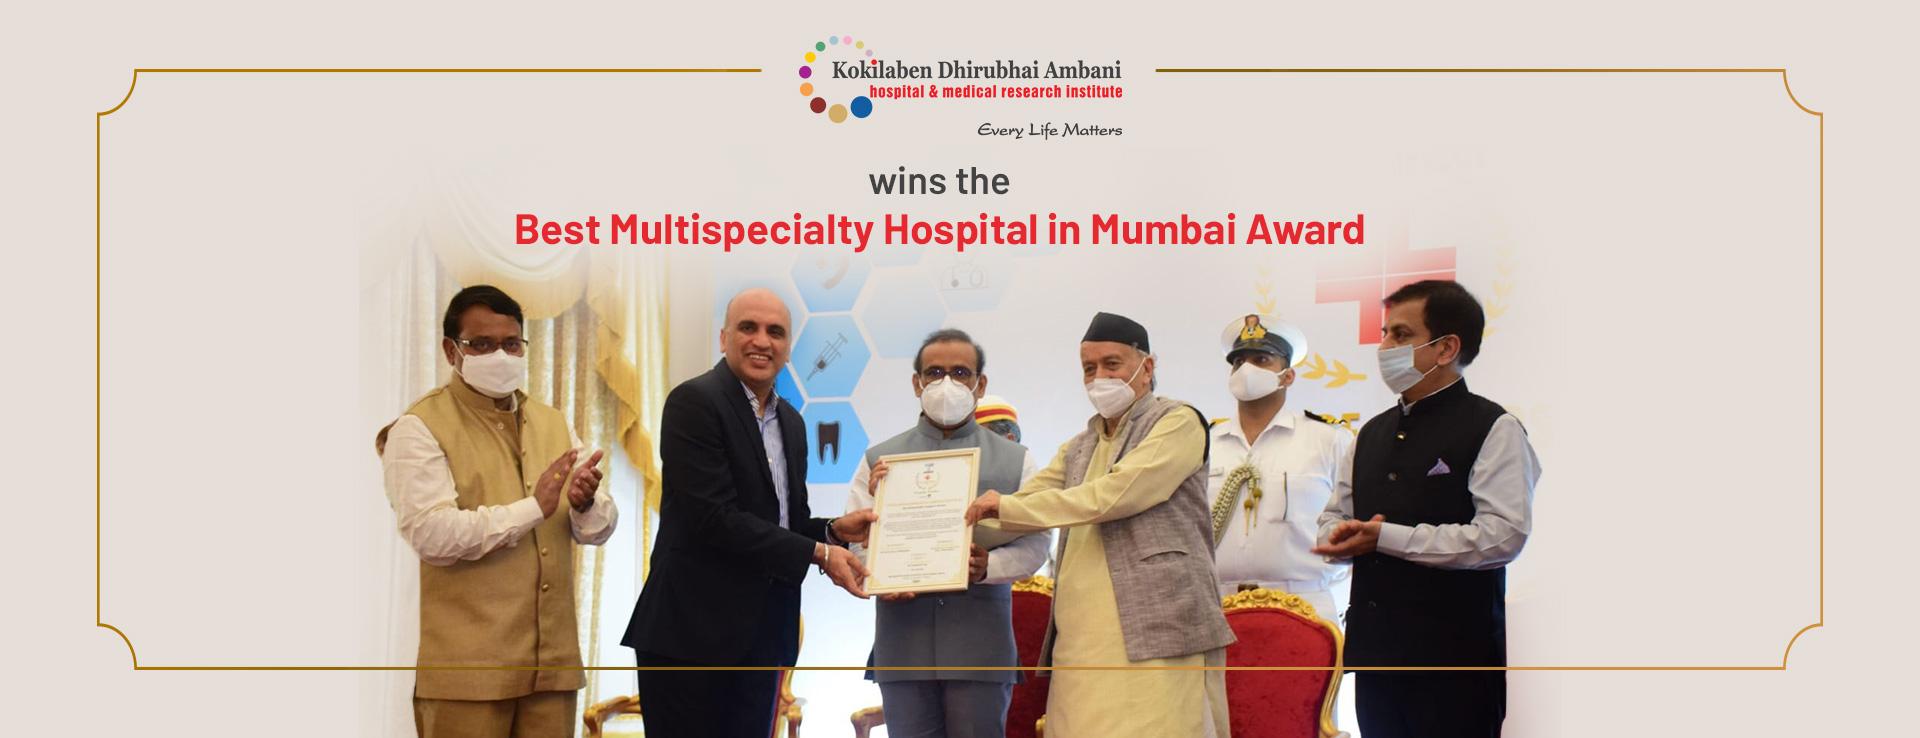 best-multispeciality-award